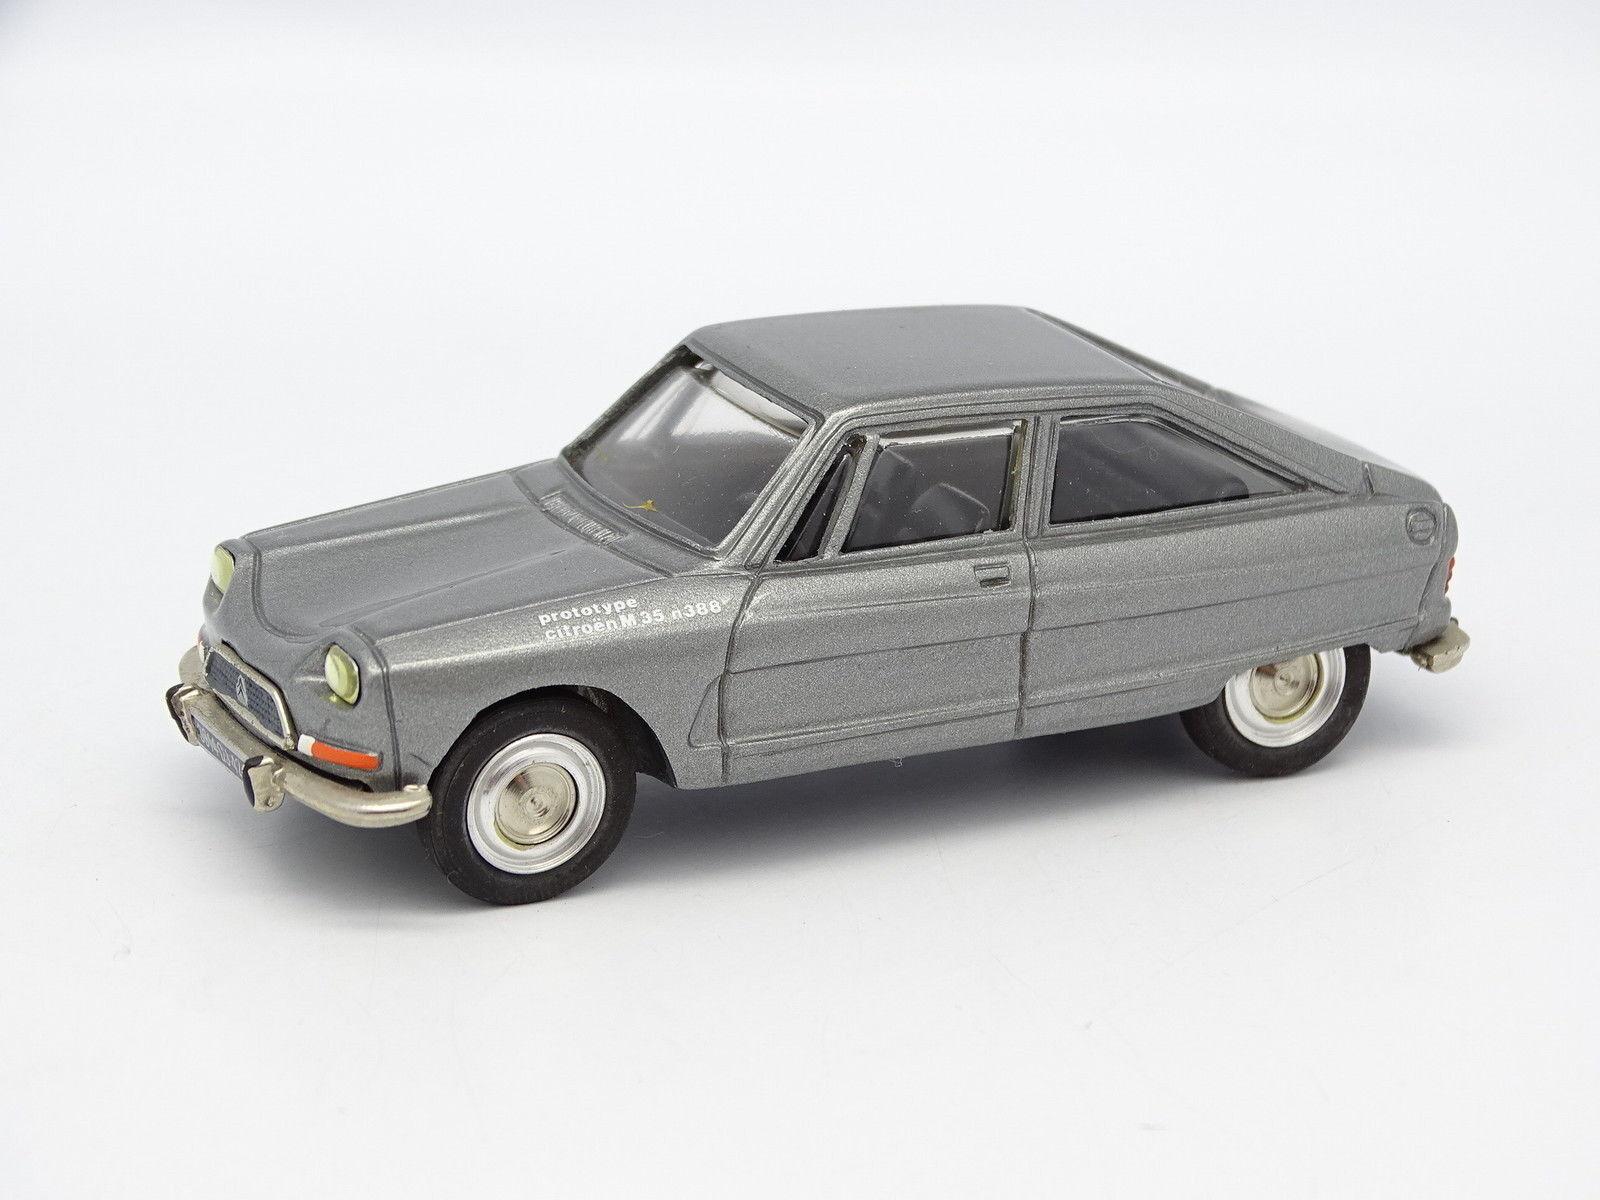 Minicar plus harz sb 1   43 - citroën ami 8 prototyp m35 1970